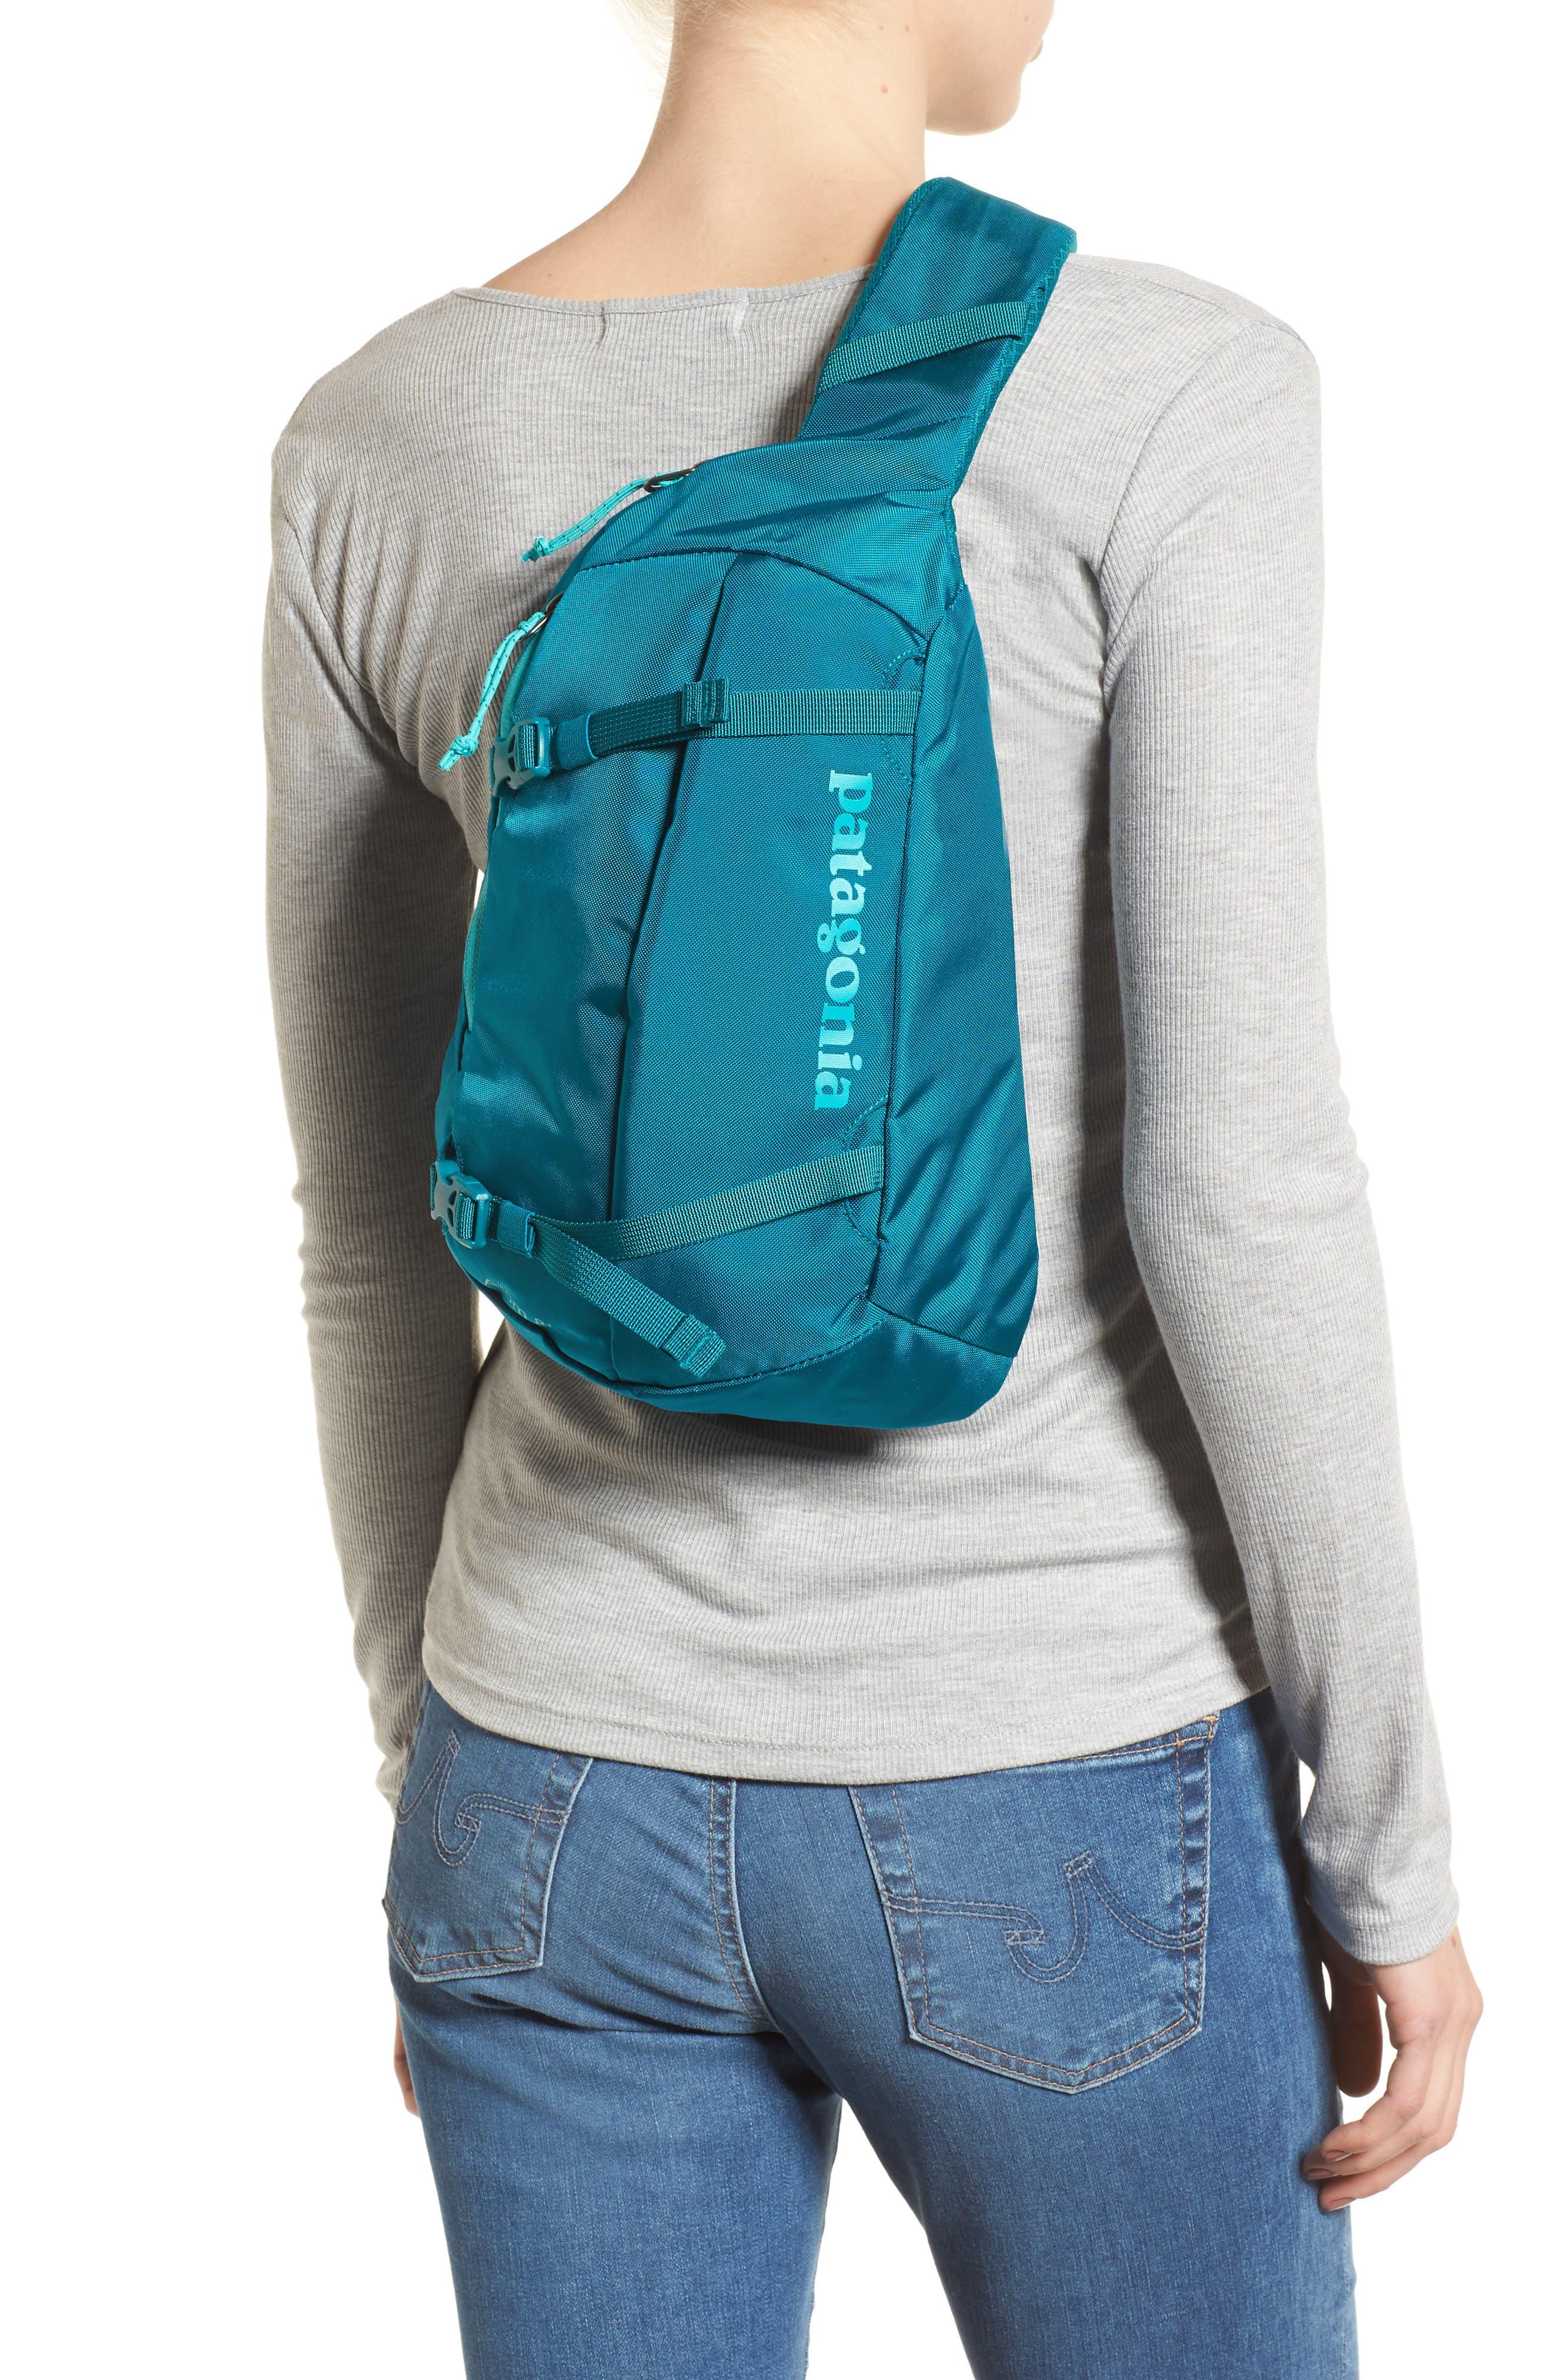 Atom 8L Sling Backpack,                             Alternate thumbnail 2, color,                             Elwha Blue